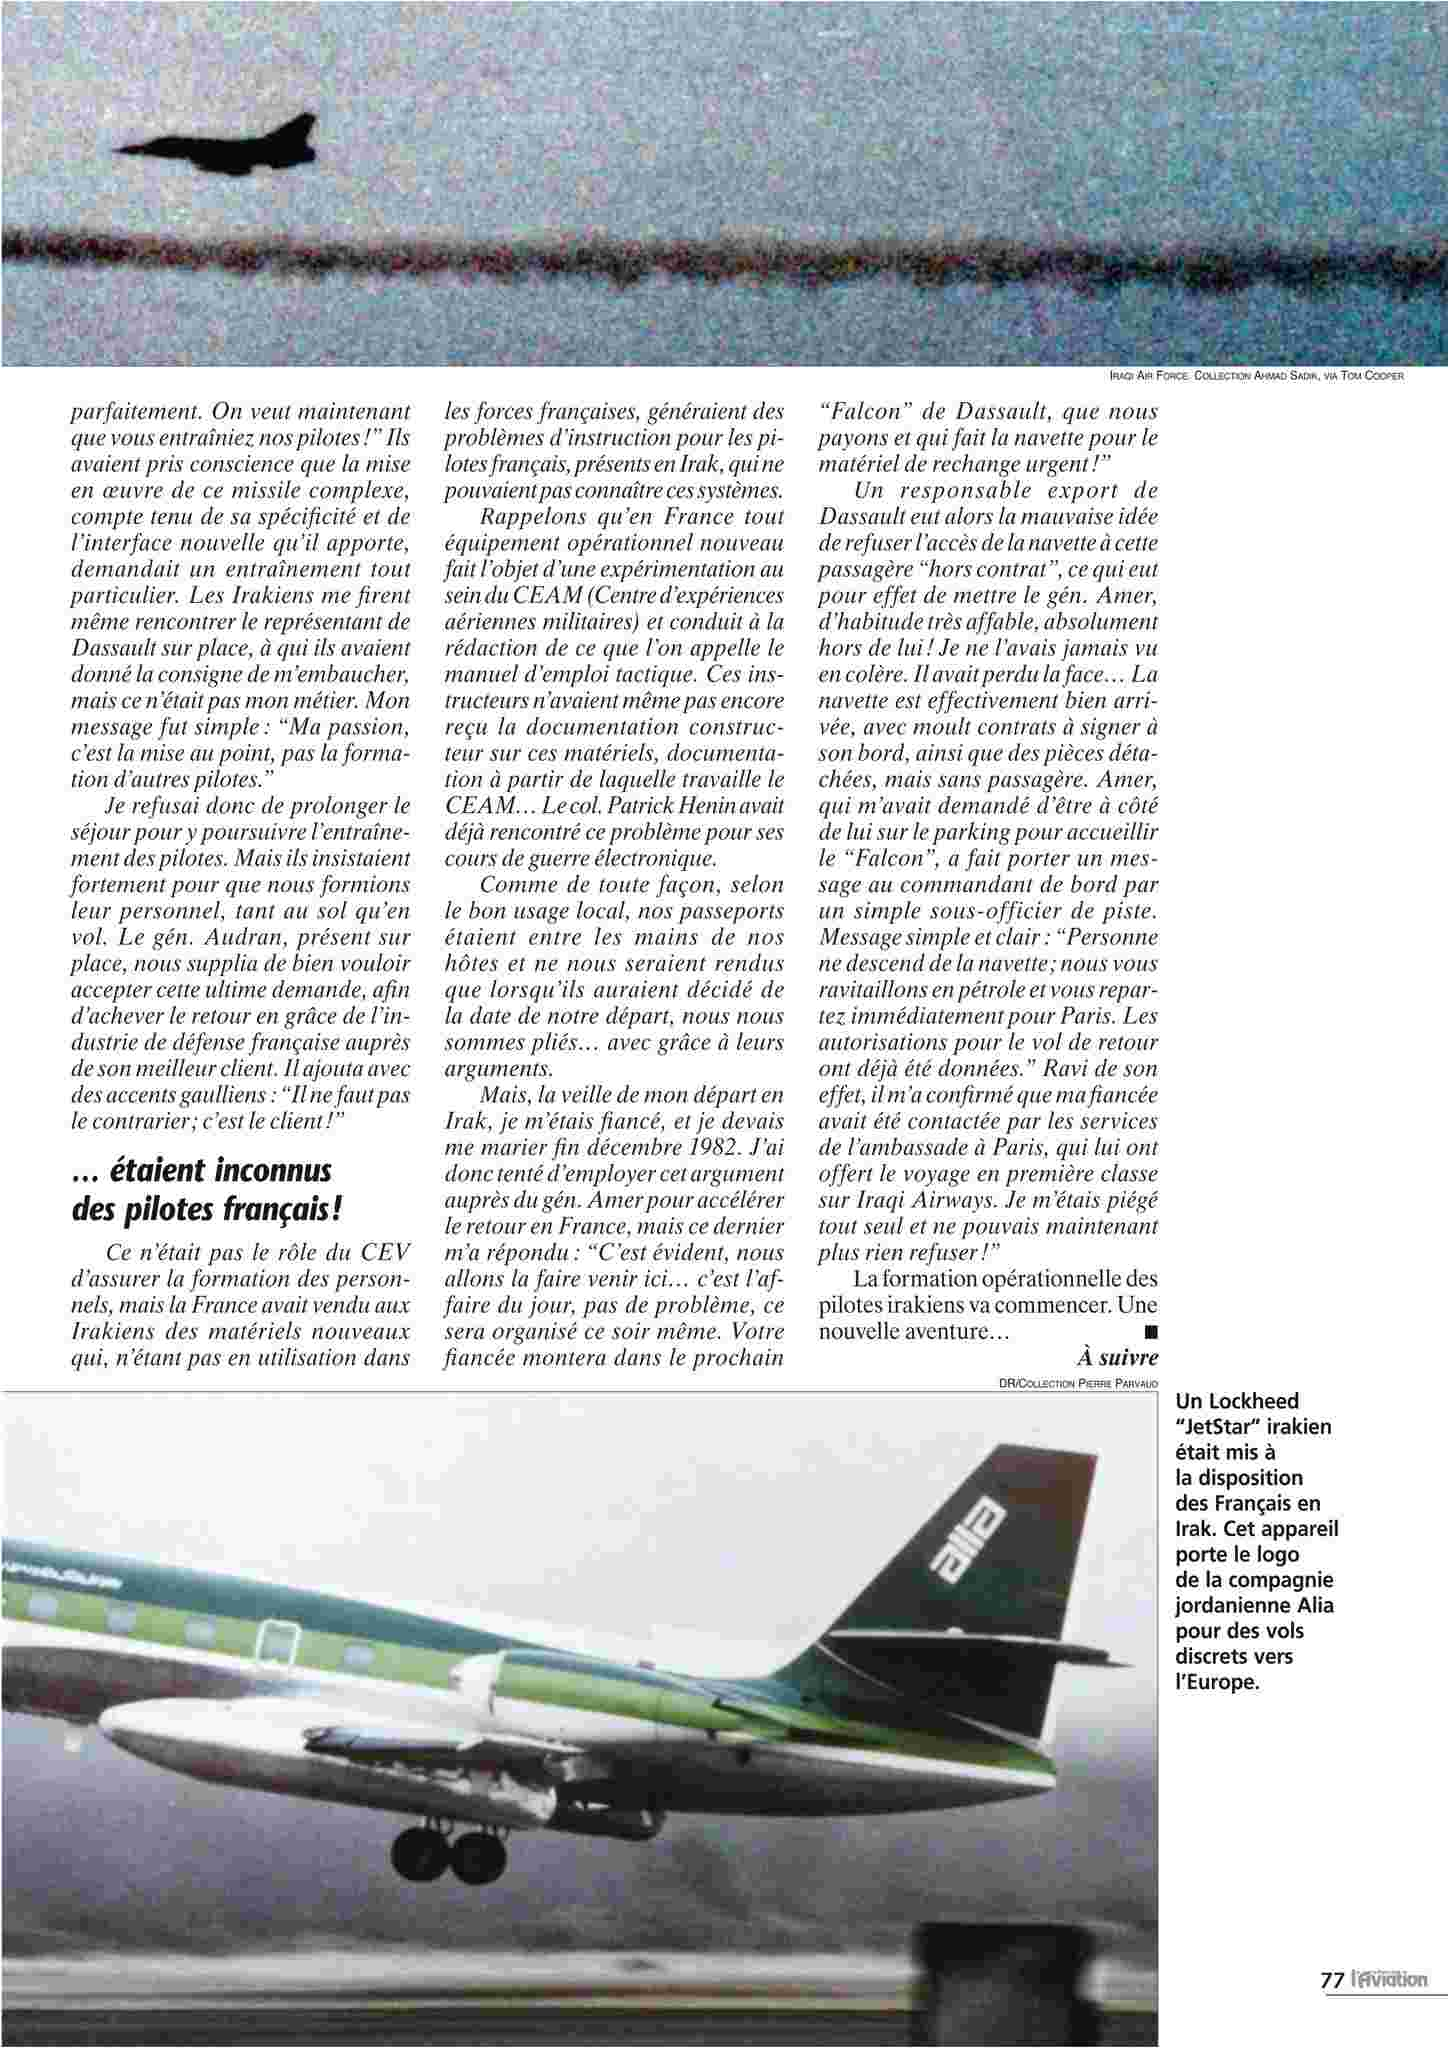 Guerre Iran-Irak - Page 3 A03310